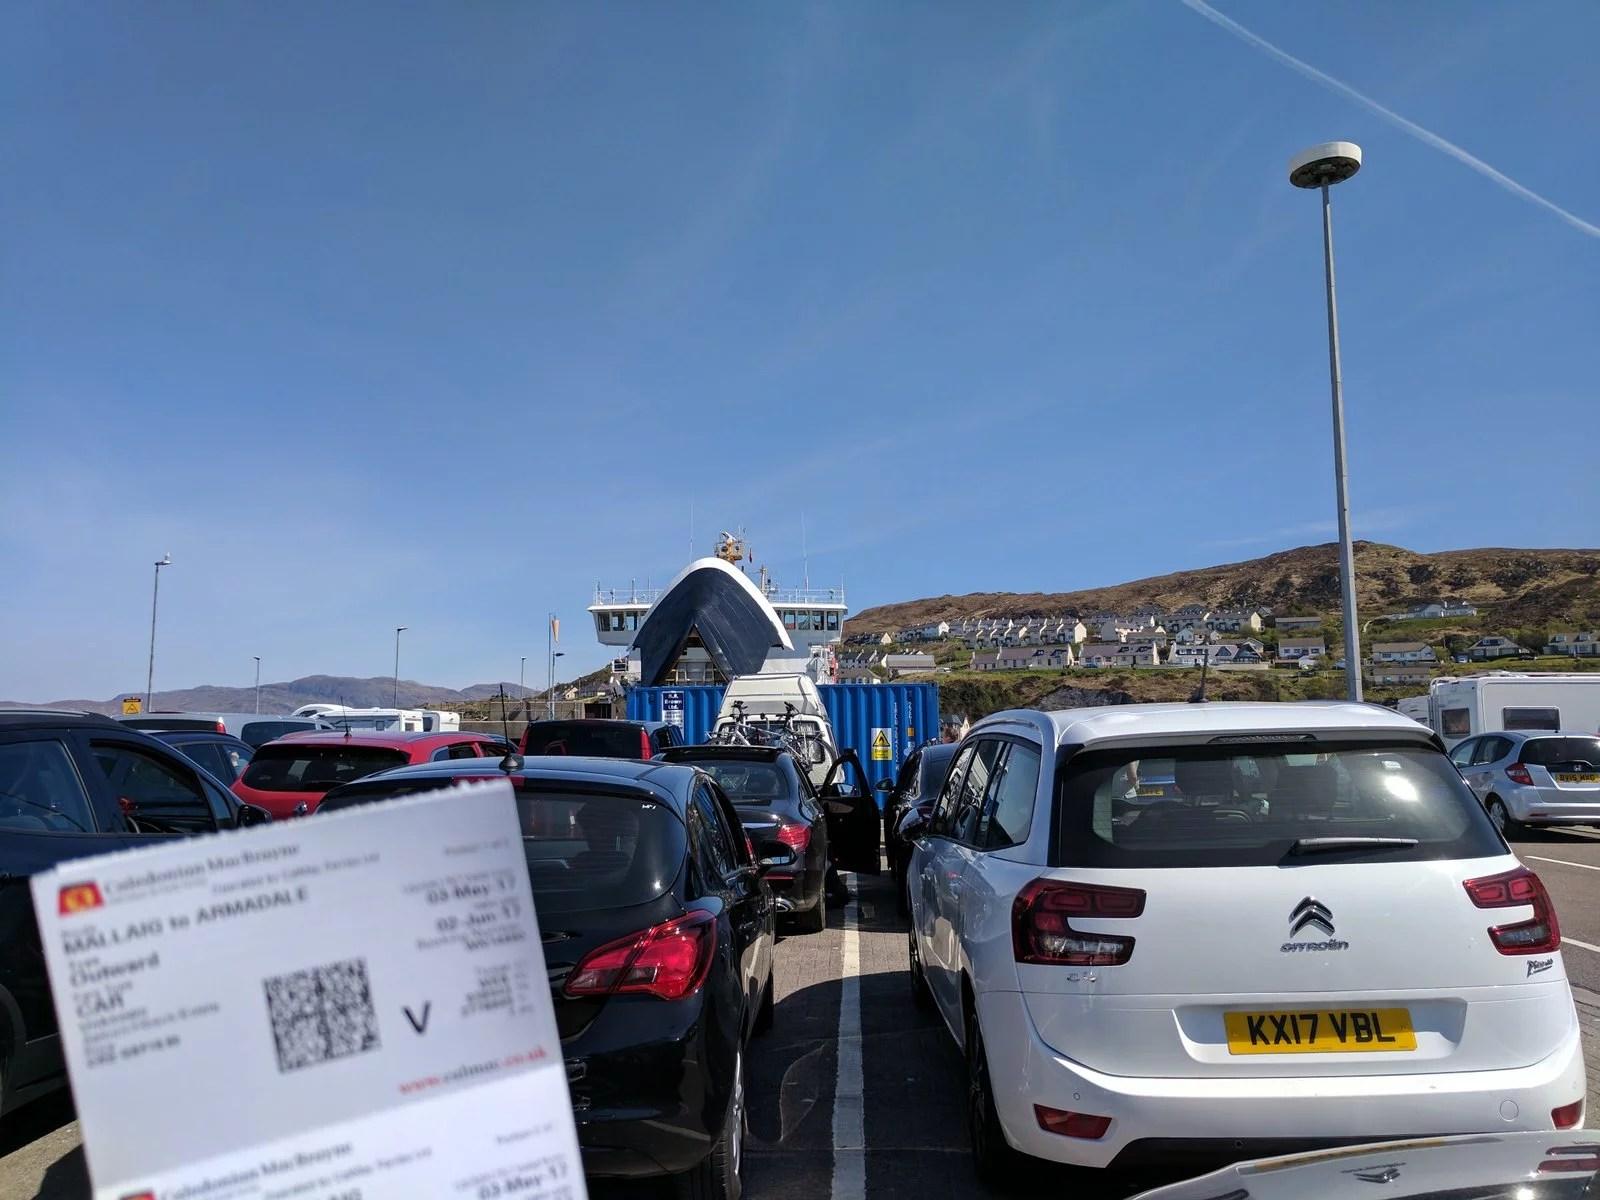 Mallaig, ferry, Isle of Skye